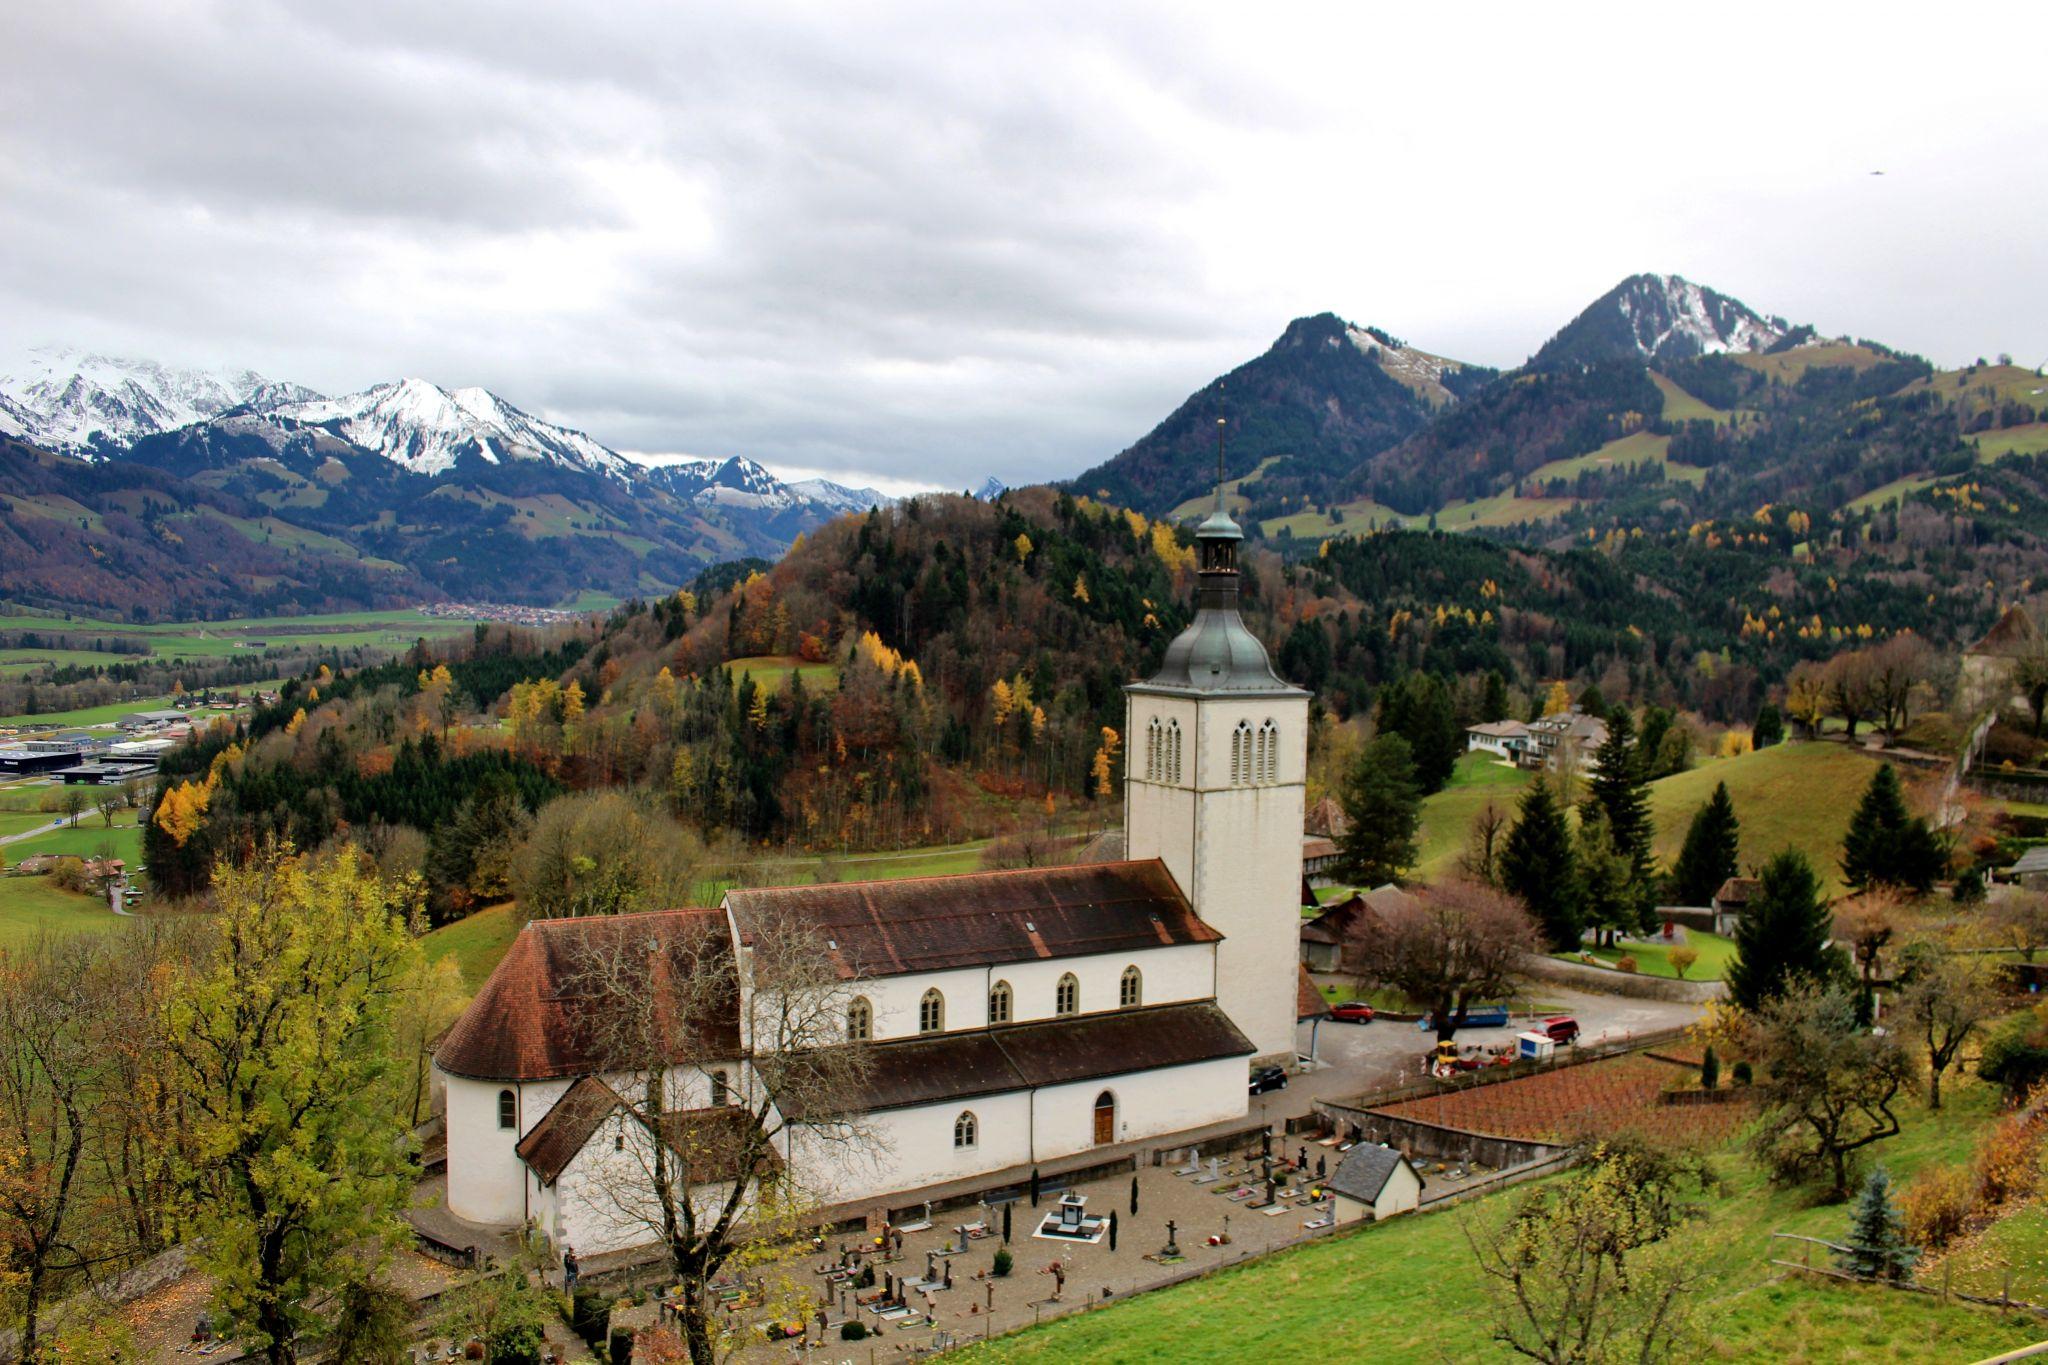 Saint-Théodule Church, Switzerland